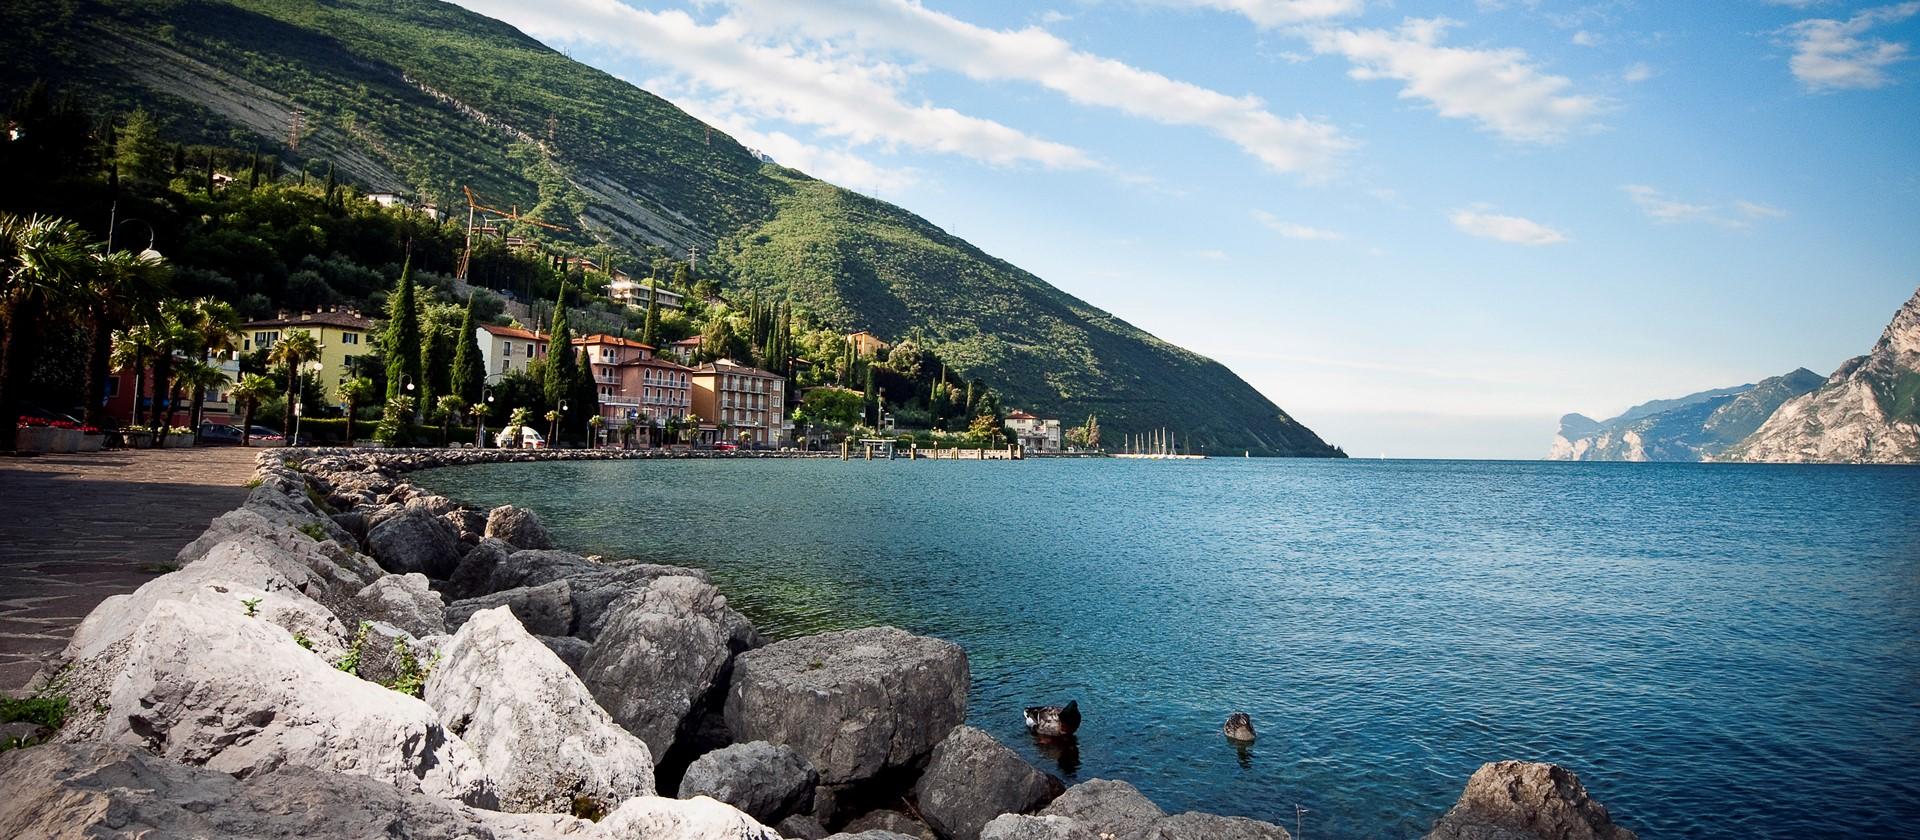 Urlaub In Torbole Nago Entdecke Den Gardasee